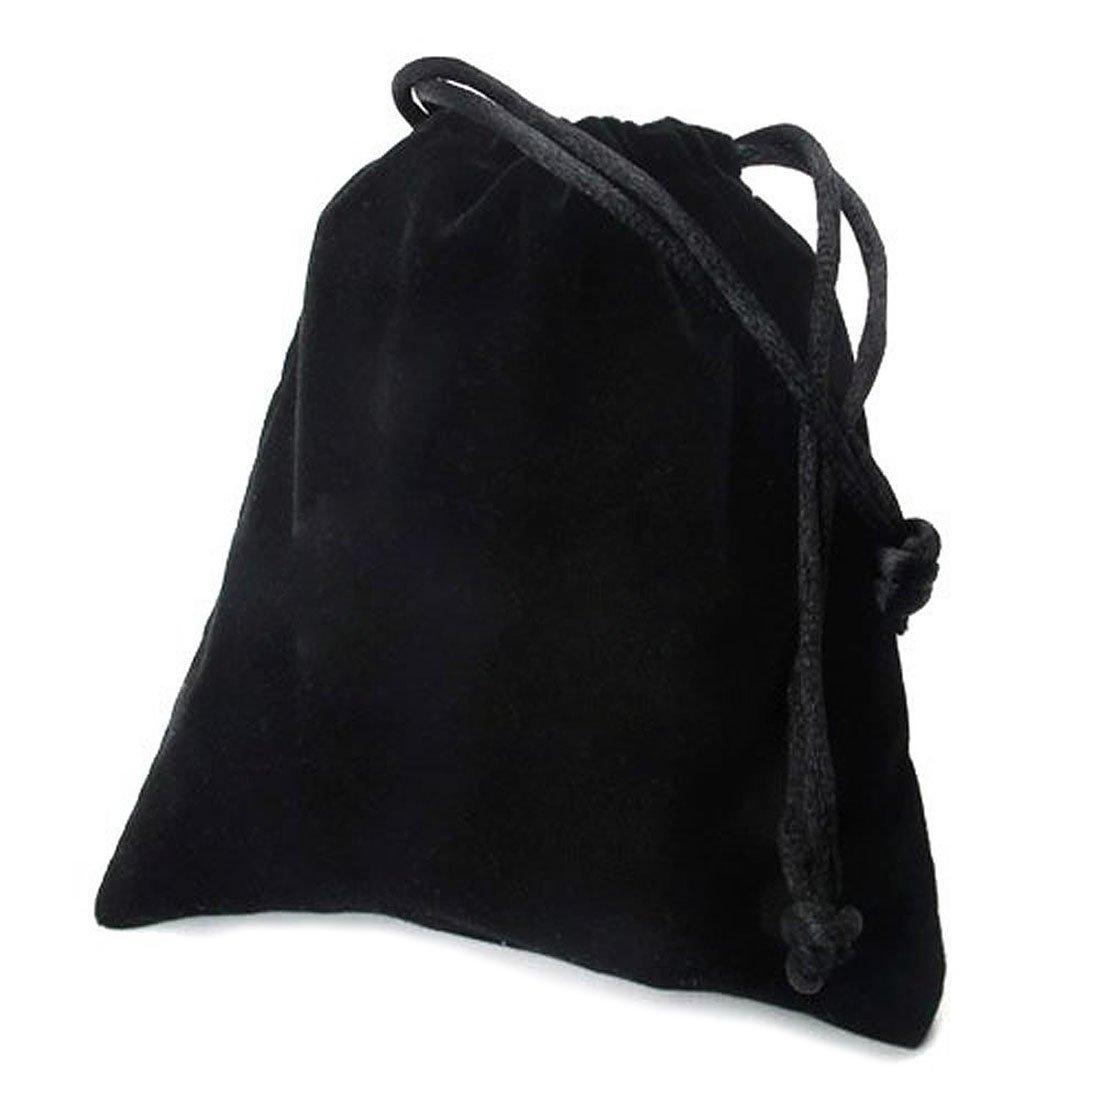 SODIAL Colgante de joyeria de Acero Inoxidable de Calaveras goticas para Hombre con Collar de 50cm Negro Plata